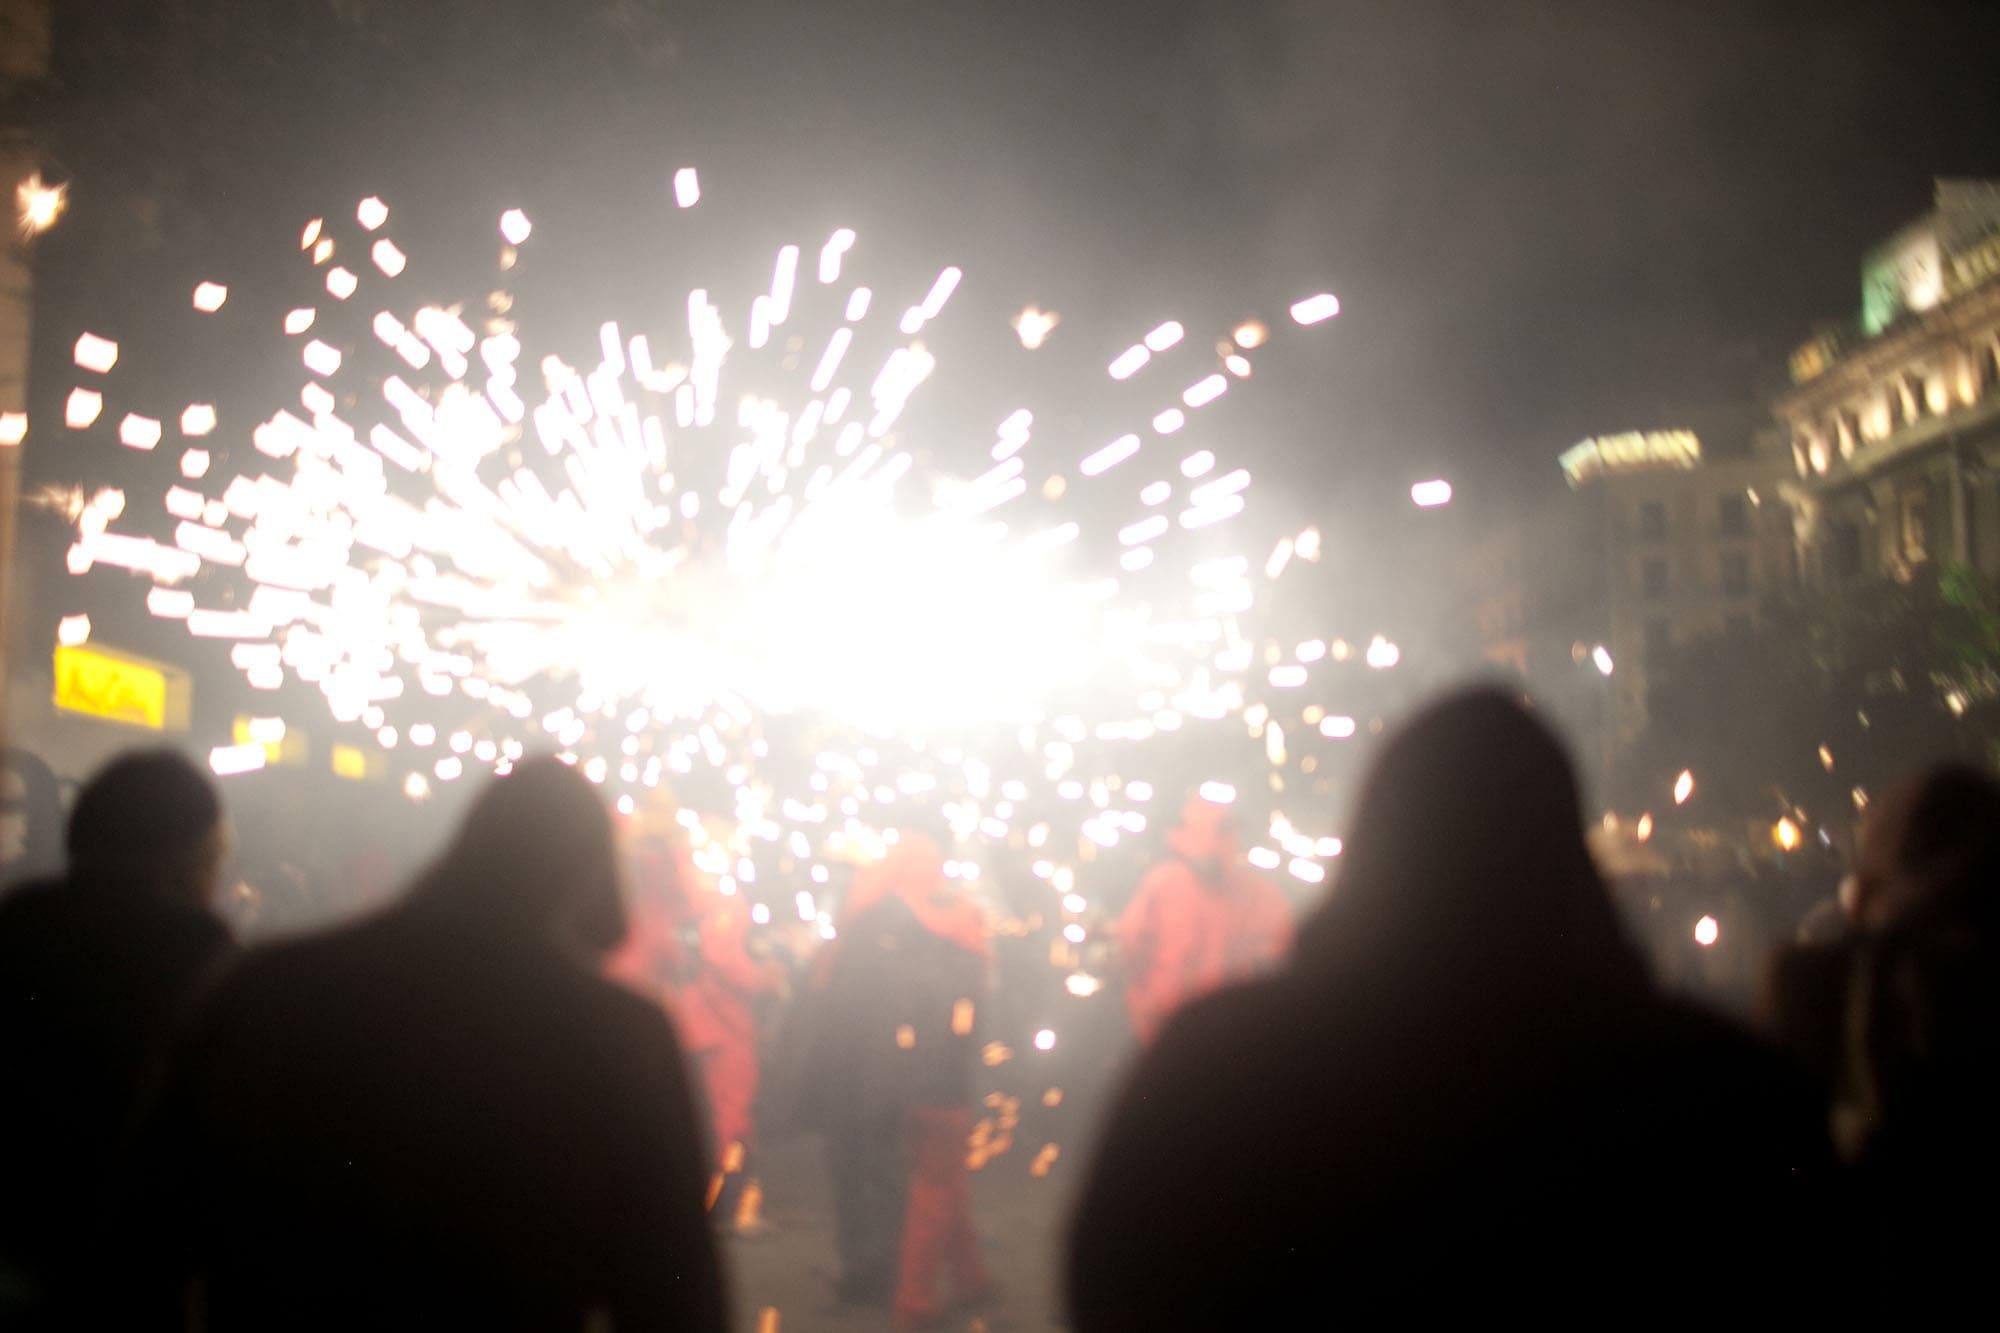 Correfoc: Hell's Gate - a fire parade at La Mercè Festival in Barcelona, Spain